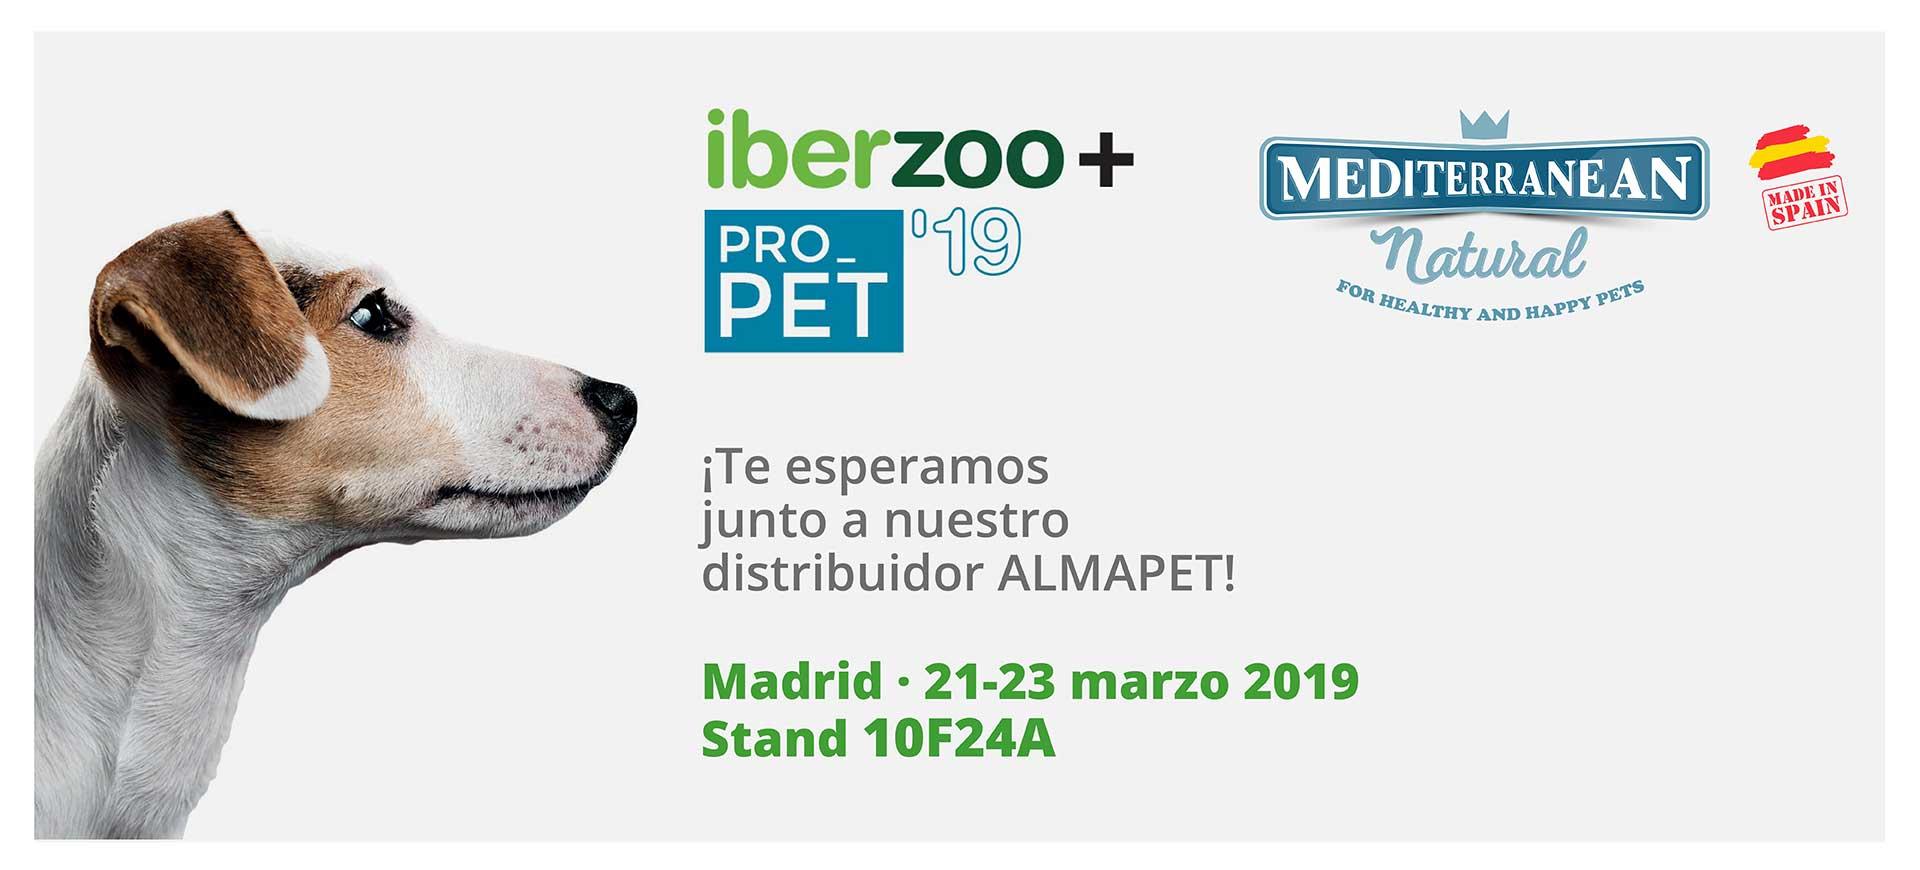 Mediterranean-Natural-en-Iberzoo-Propet-2019-Ifema-Madrid-w